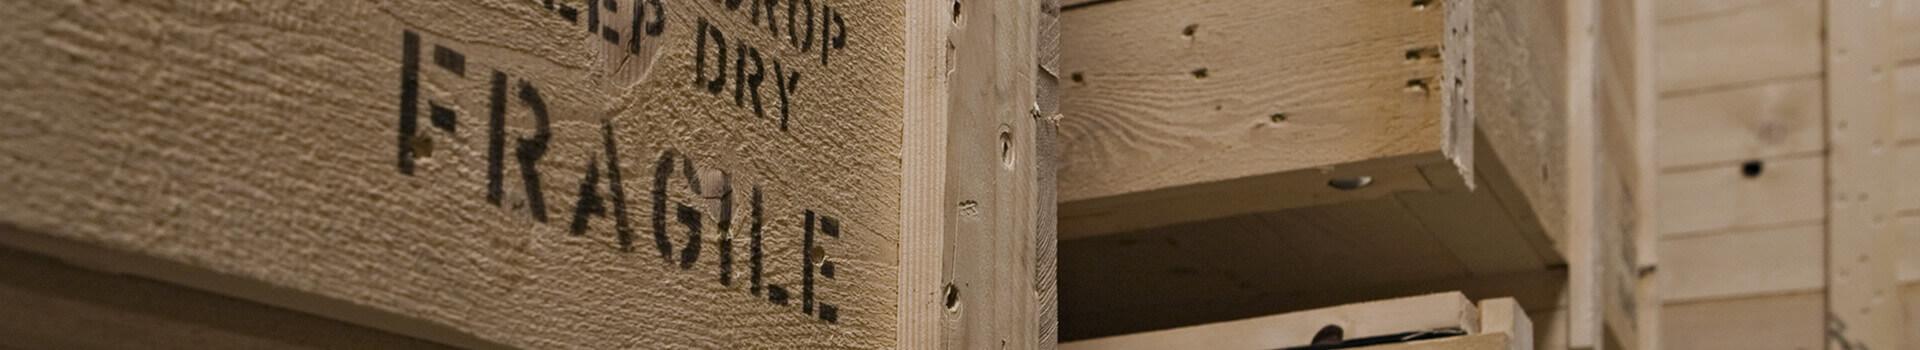 Holzkiste Selber Bauen In 7 Schritten Anleitungen Com